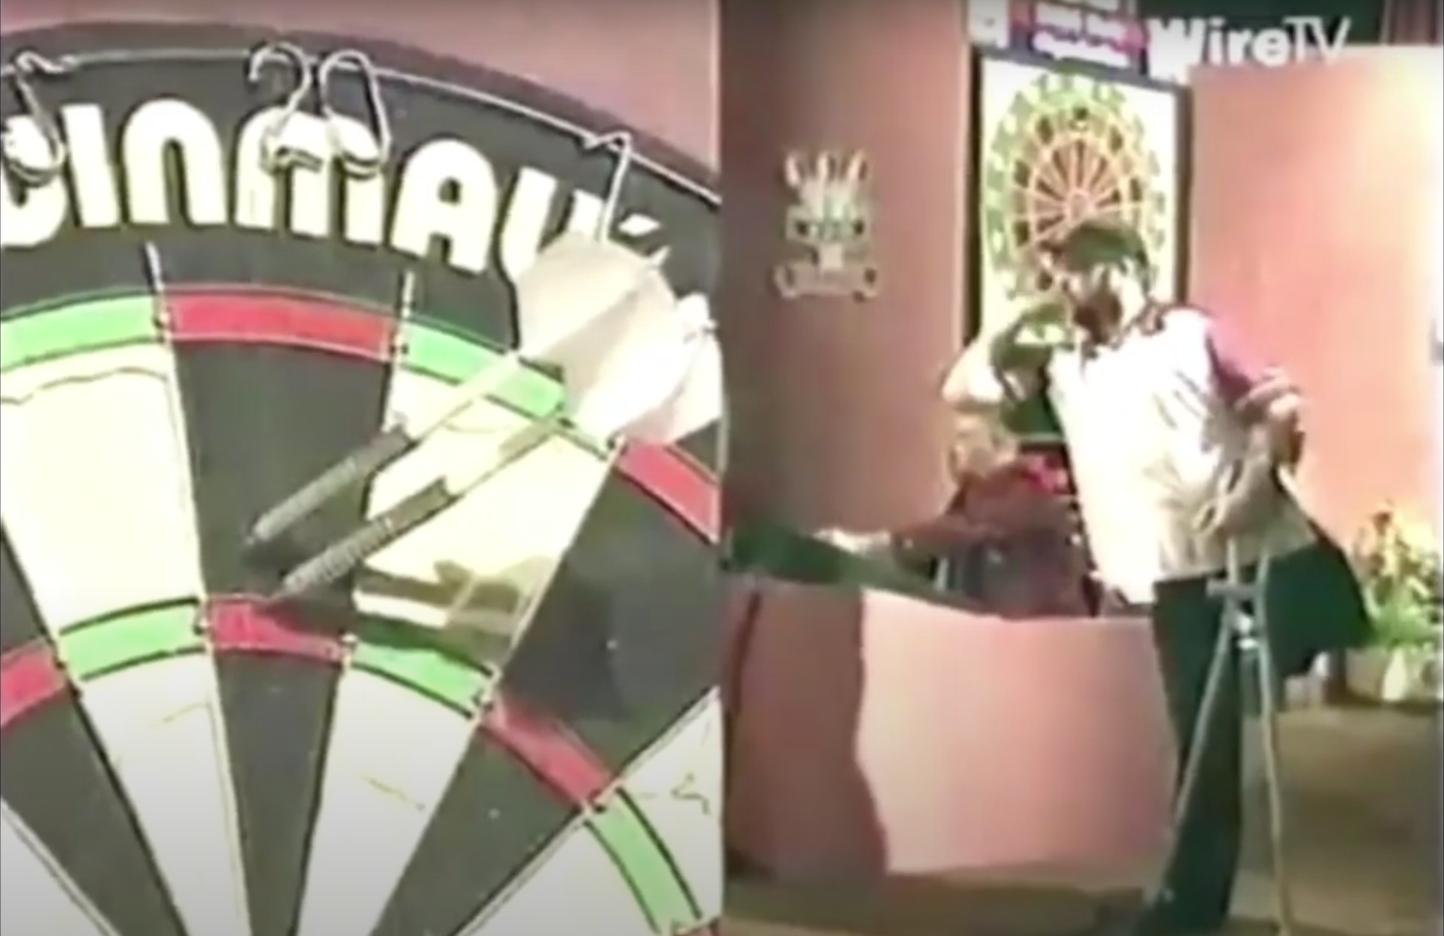 VIDEO: One-legged Darts Player Alan Chaffey Beats World Number 1